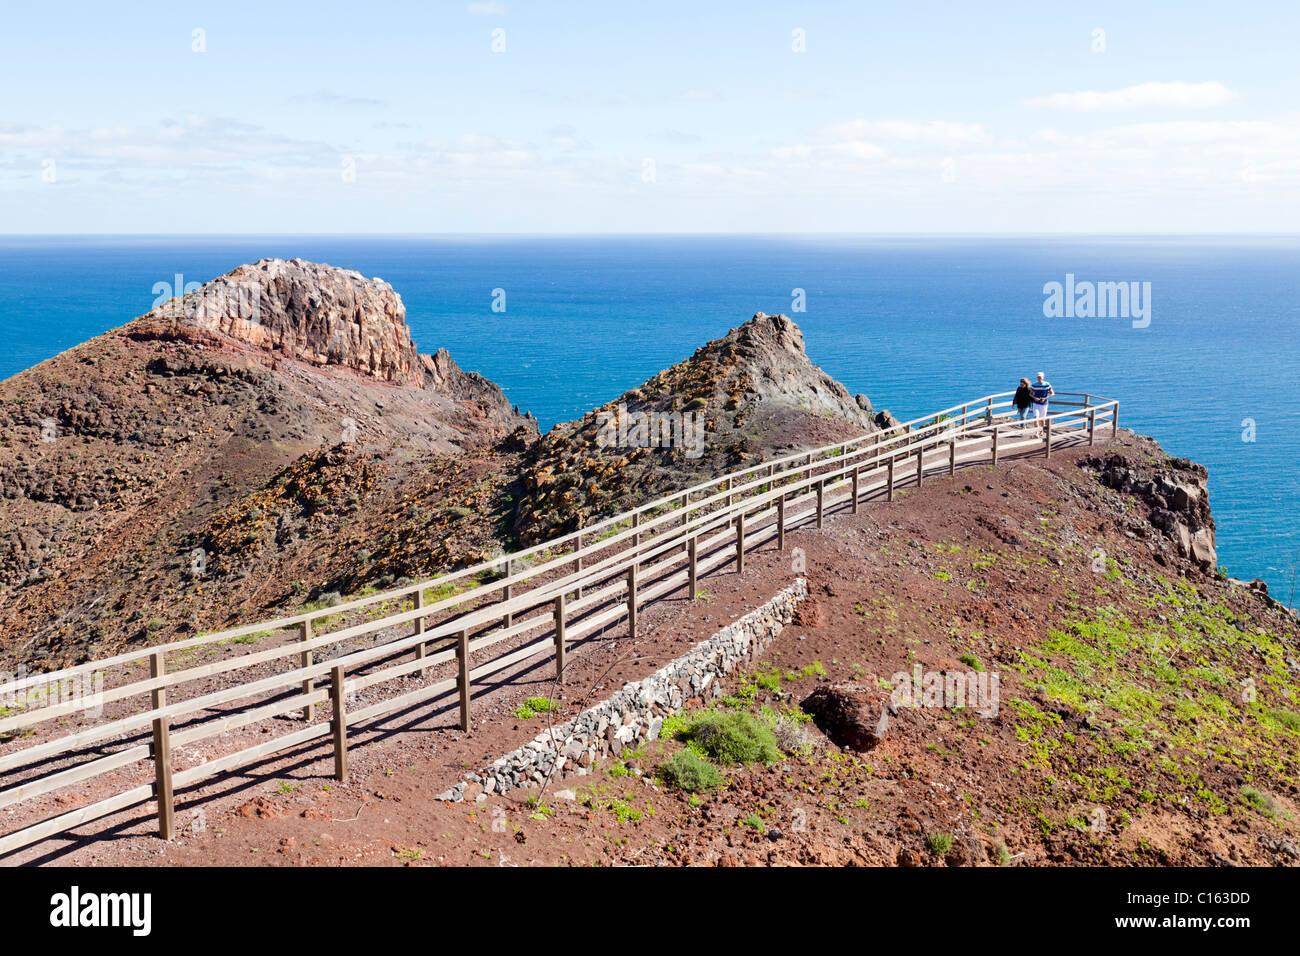 A viewpoint over the Atlantic Ocean on the cliffs beside the lighthouse, El Faro de la Entallada, on Fuerteventura - Stock Image